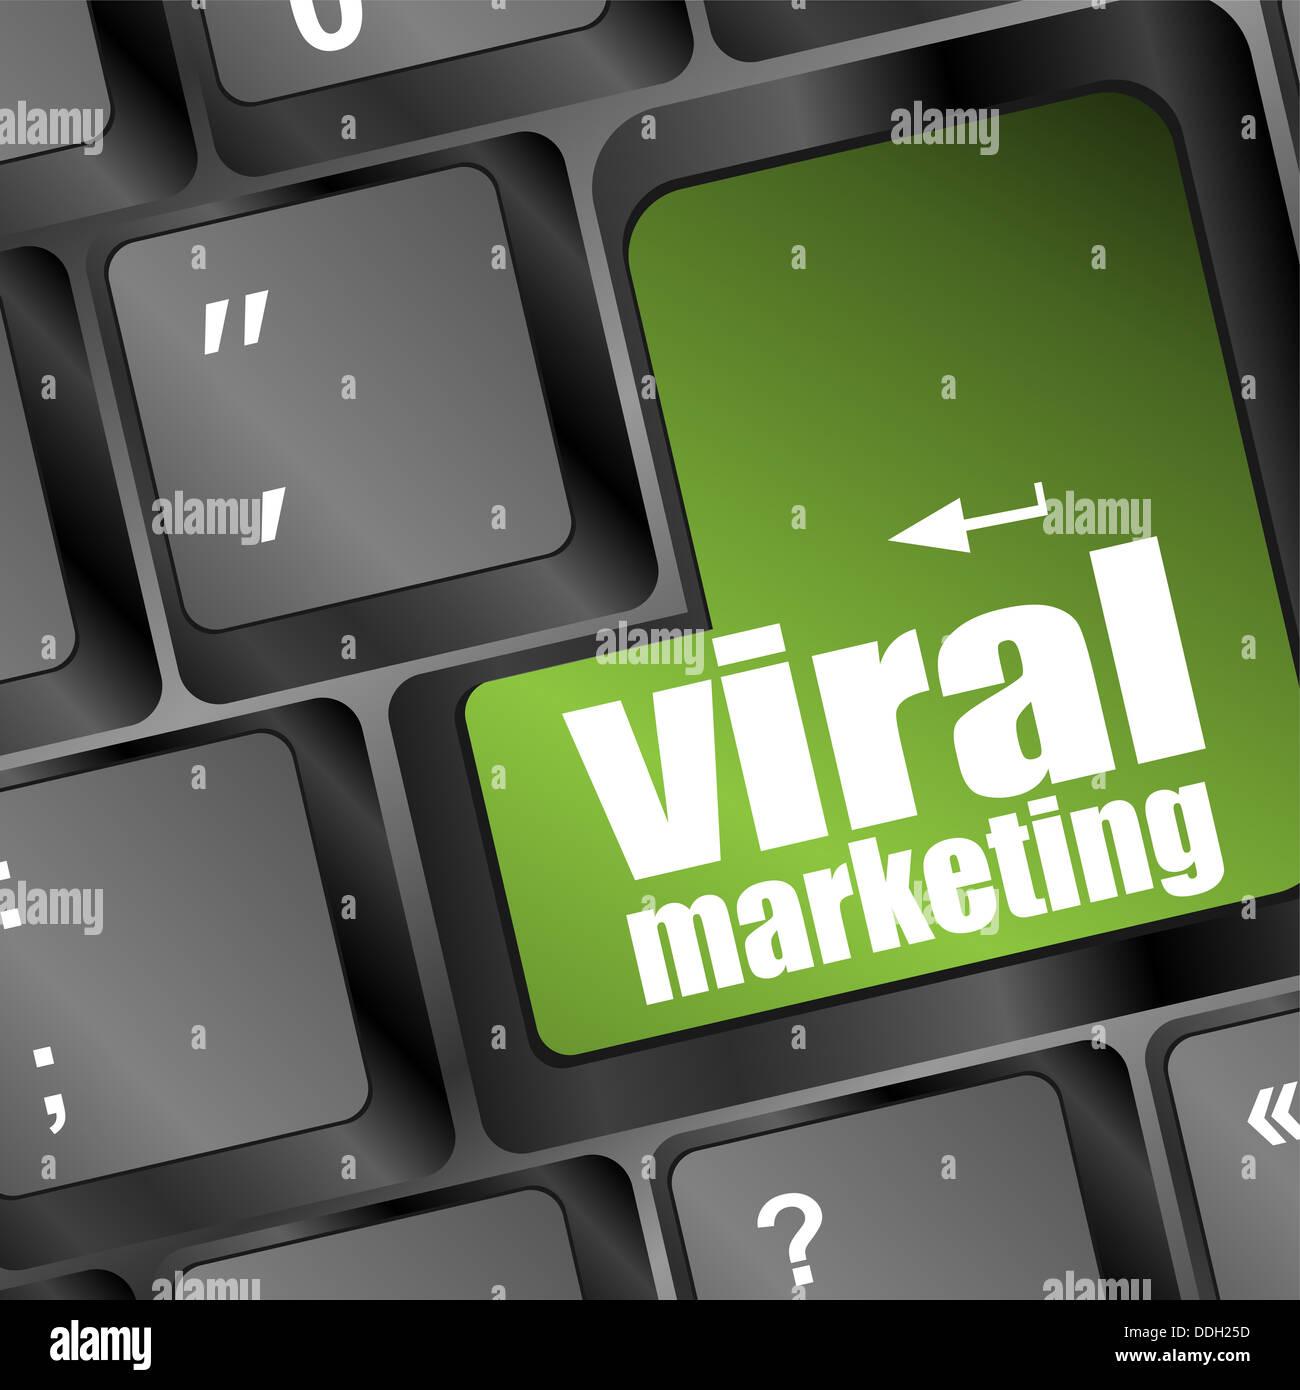 viral marketing word on computer keyboard - Stock Image